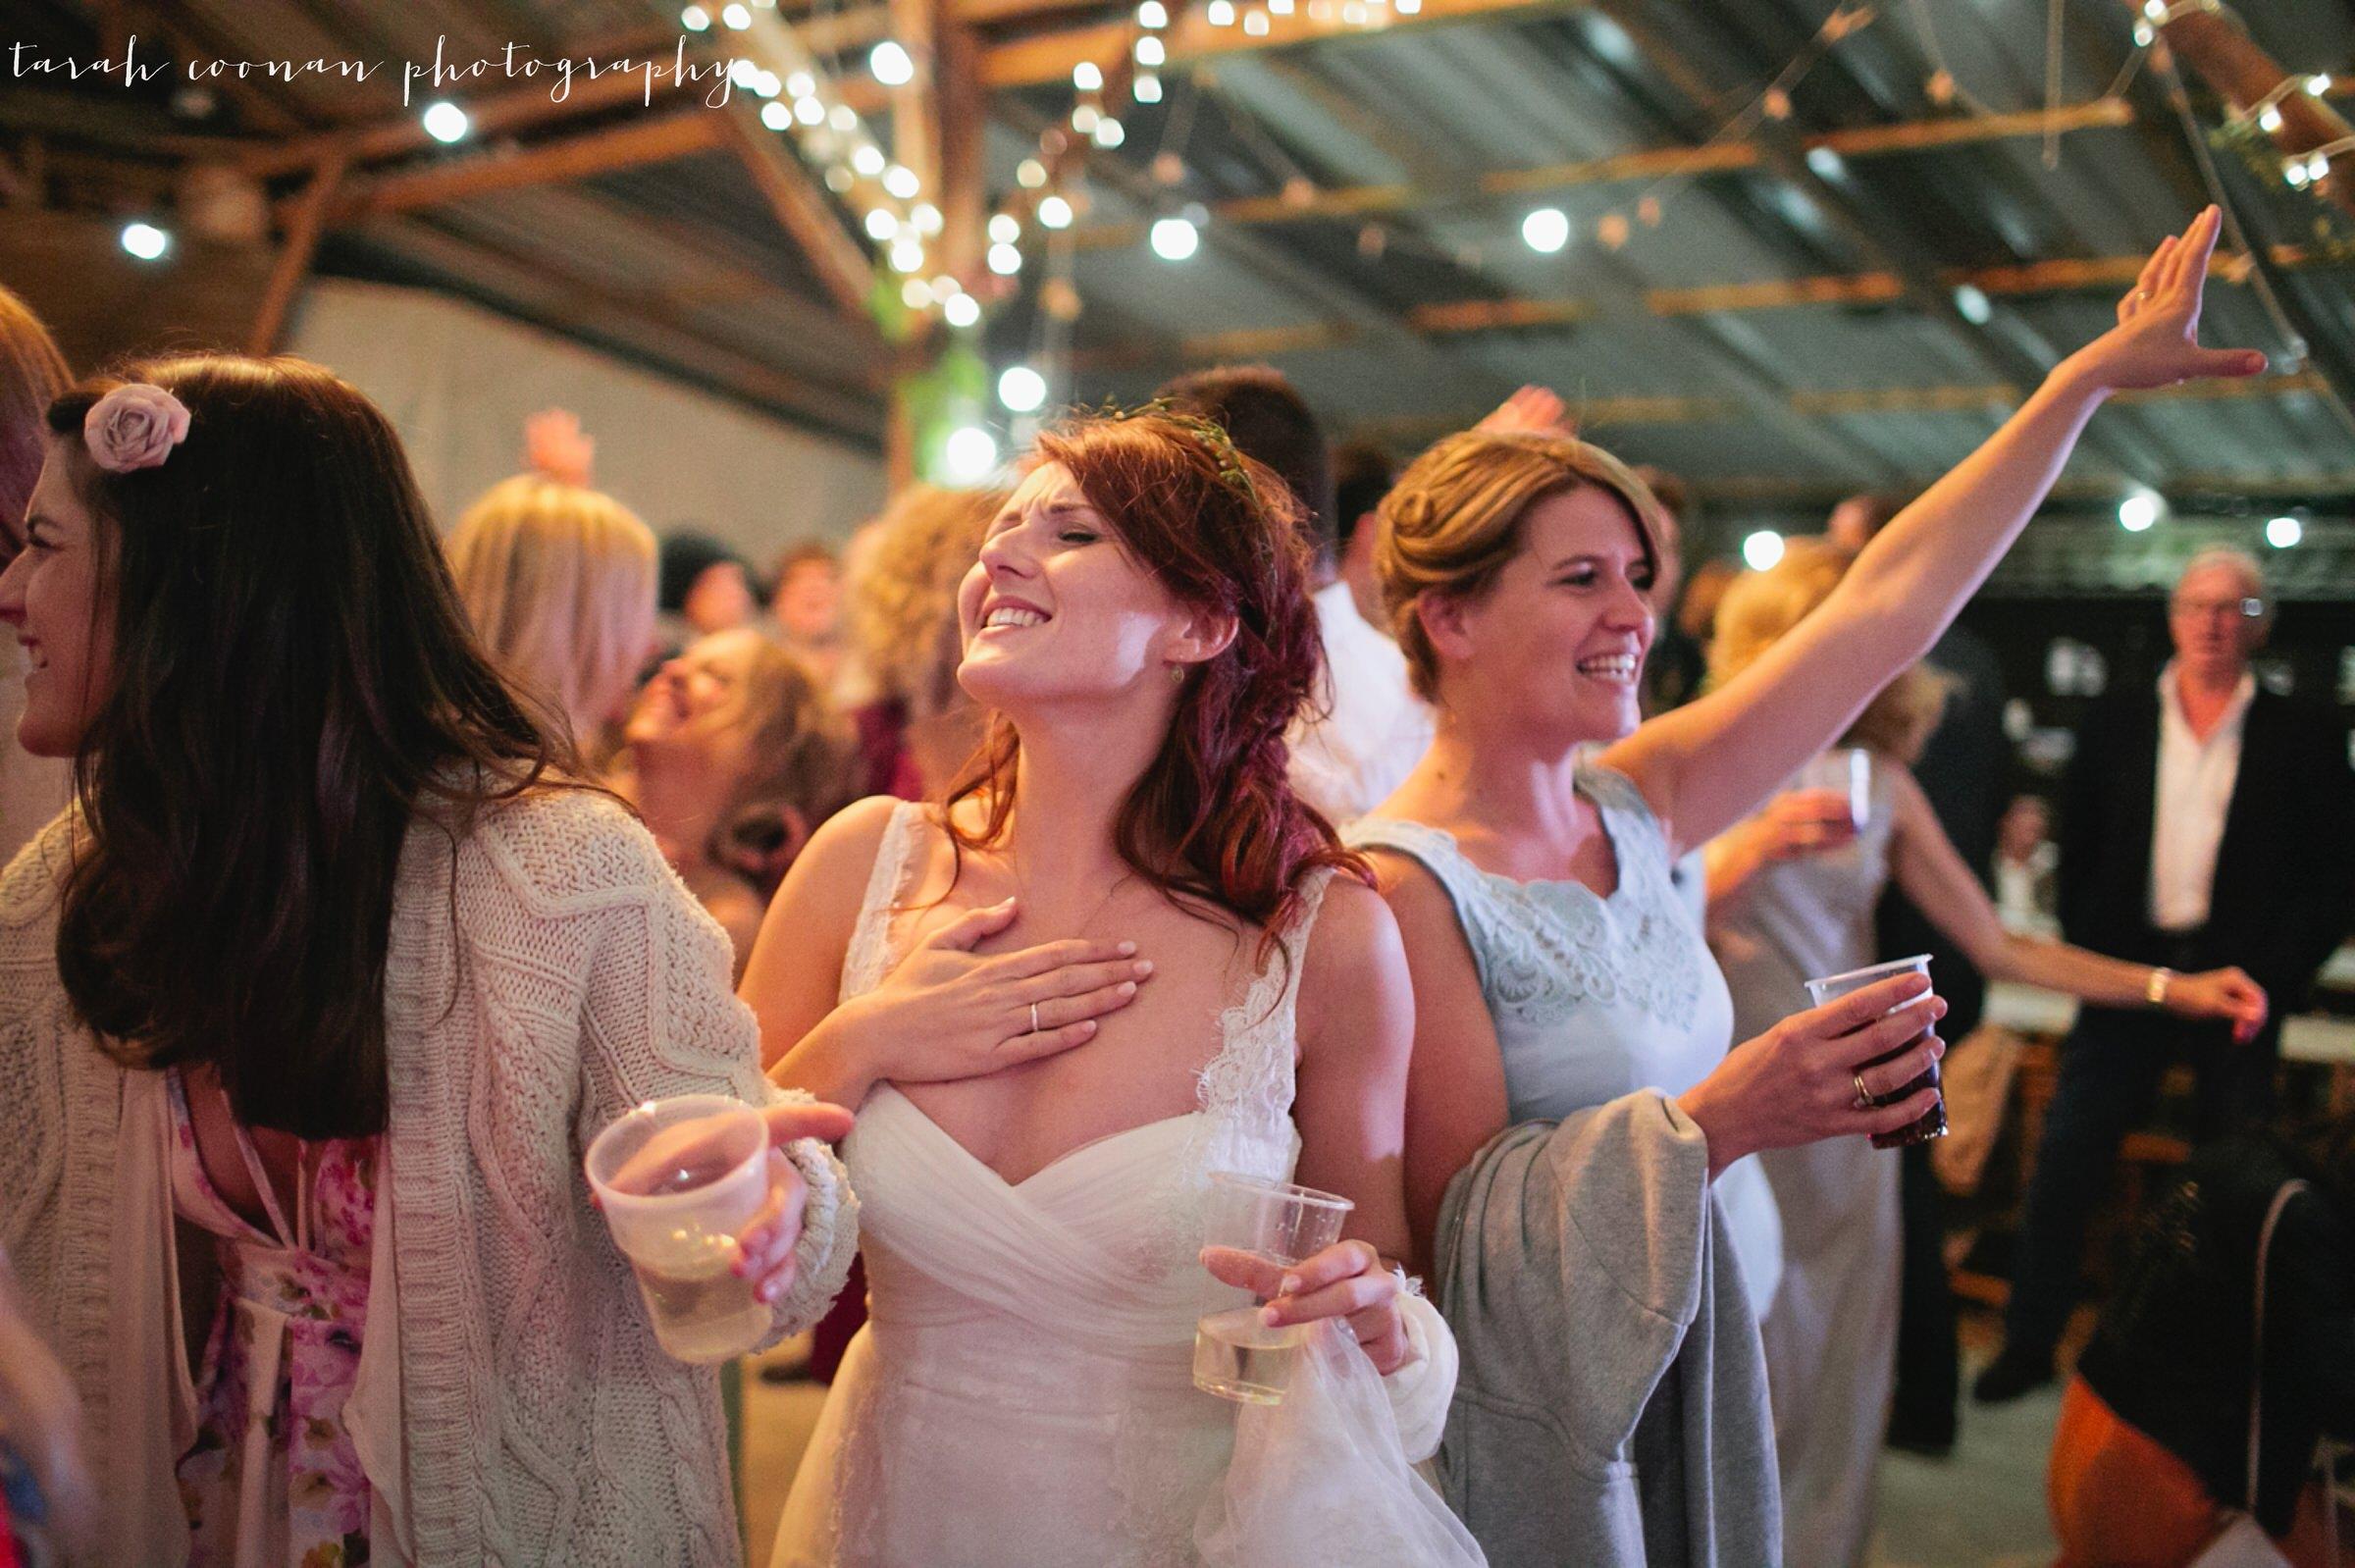 brighton-wedding-photographer108